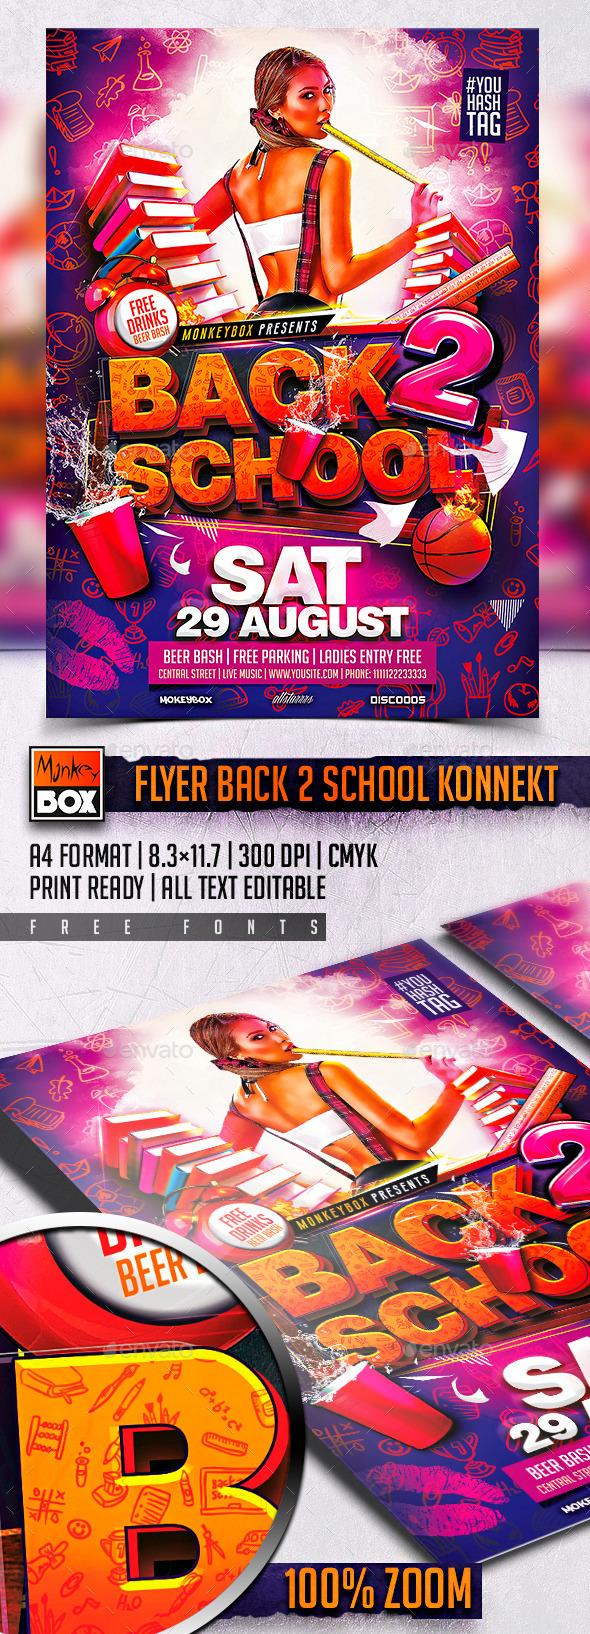 Flyer Back 2 School Konnekt - Events Flyers